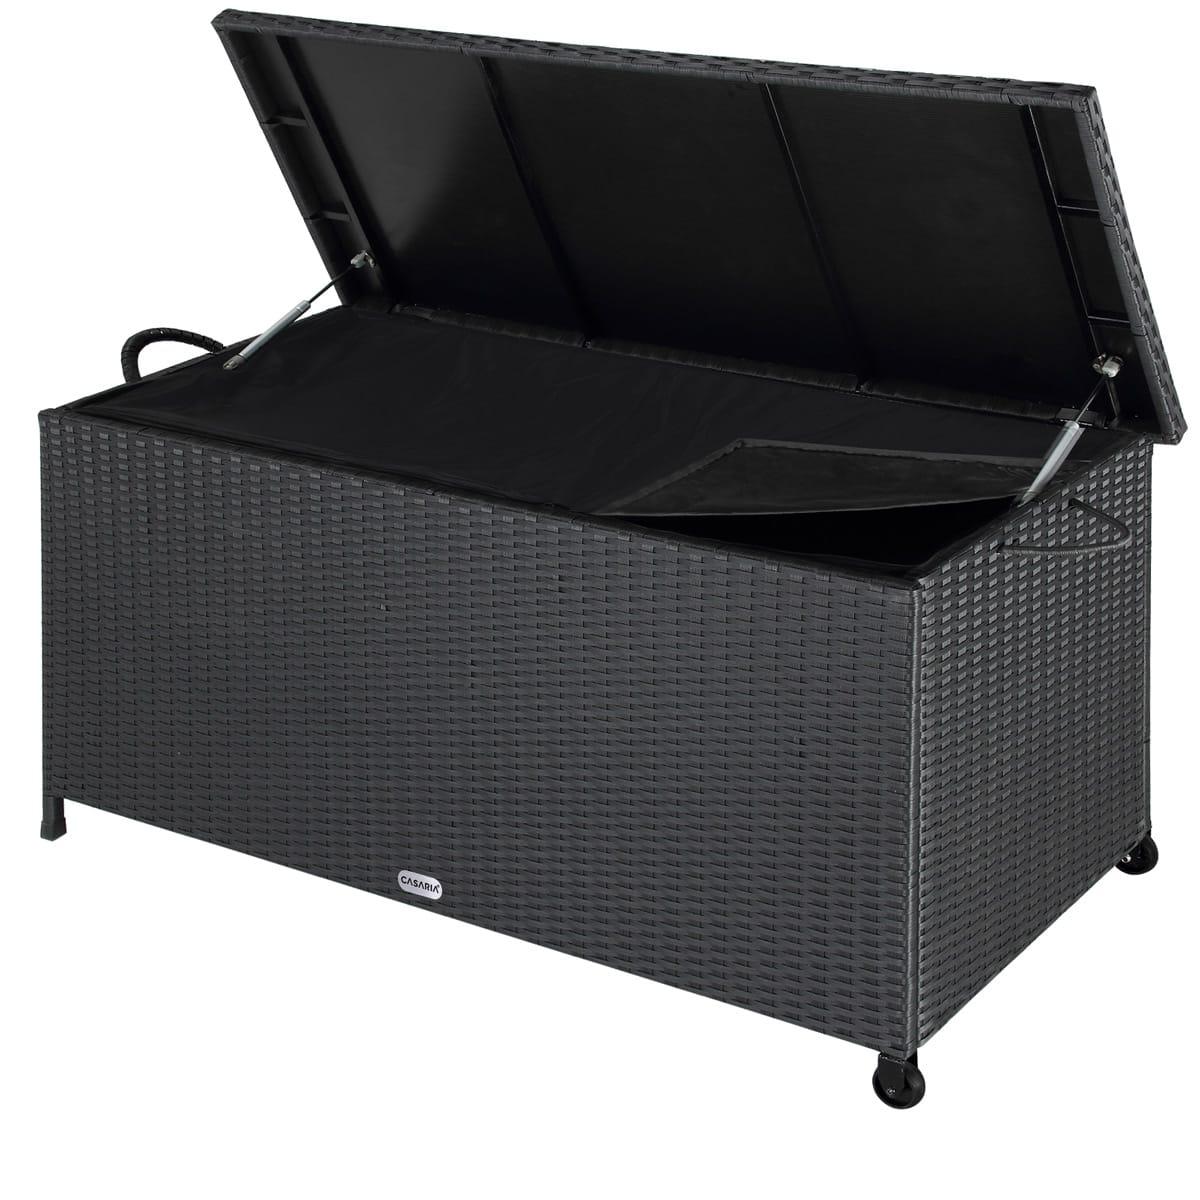 Poly Rattan Garden Storage Box Black 4x1 8x2ft Deubaxxl Com